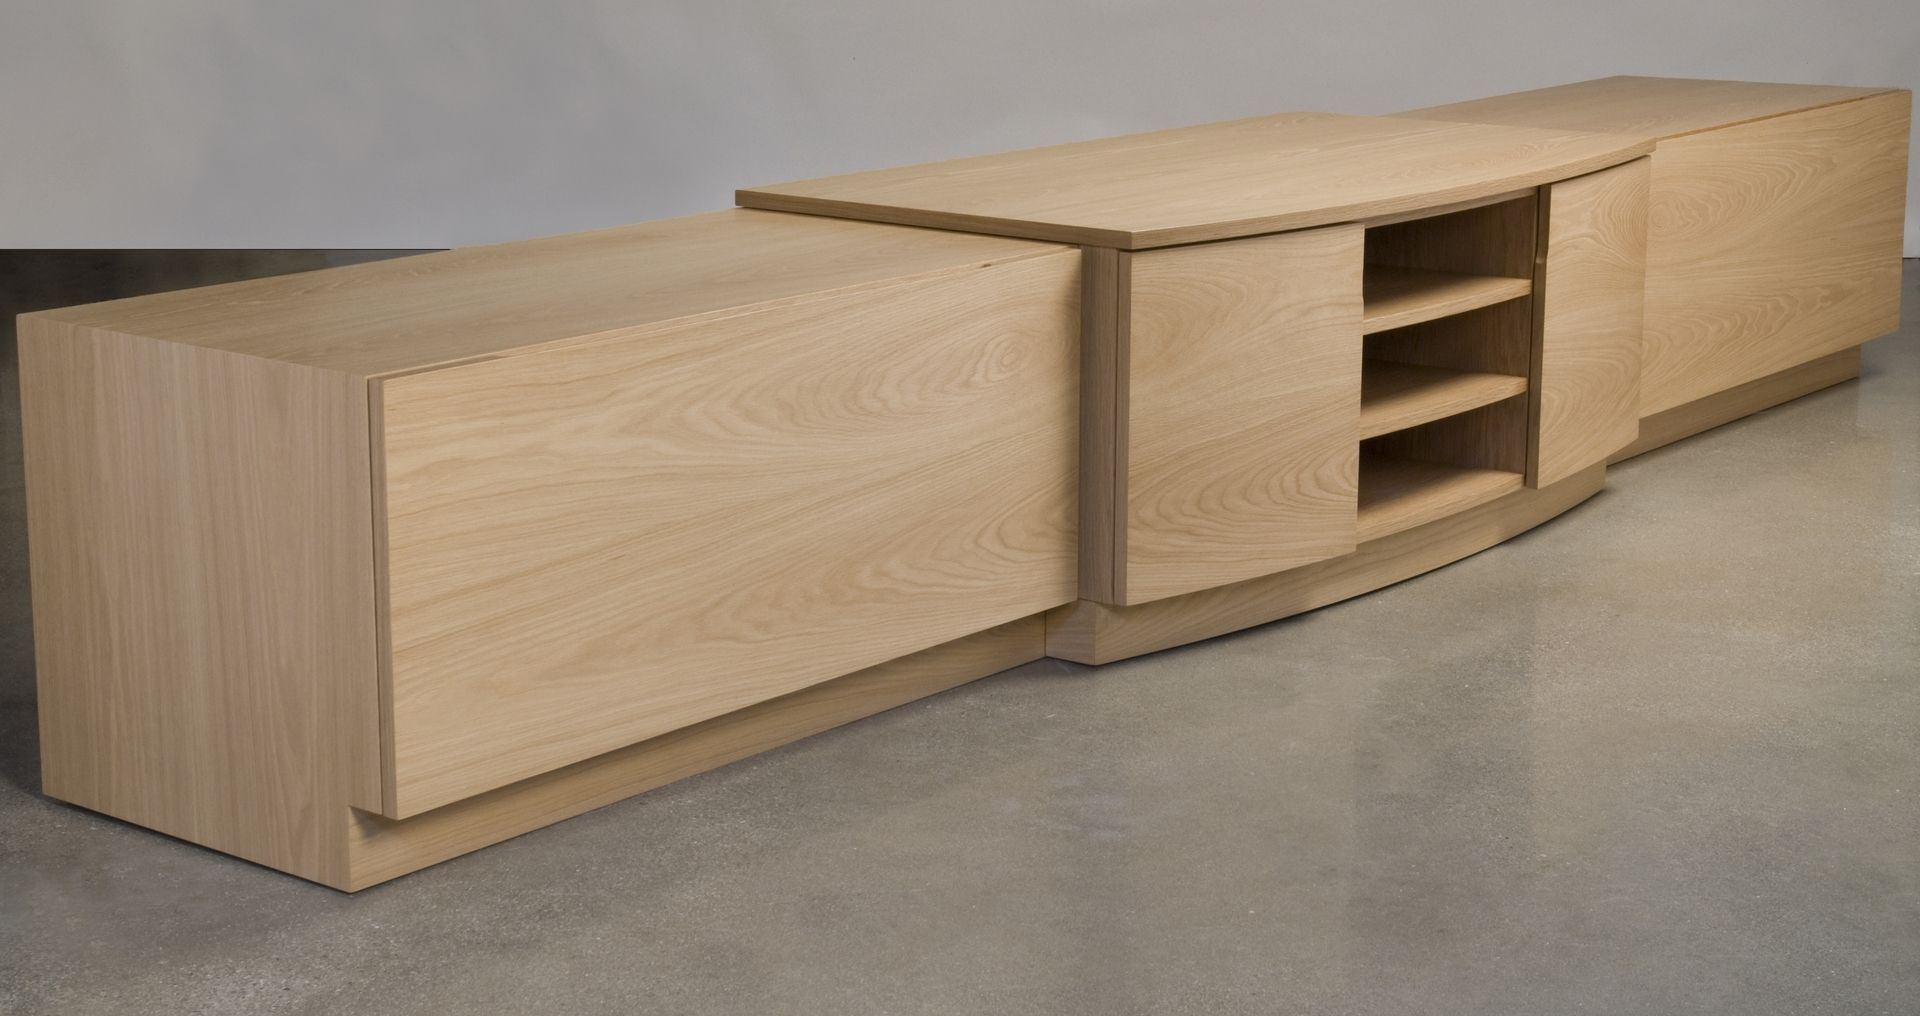 White Oak Furniture ~ Custom made mobile white oak audio video credenza by eben